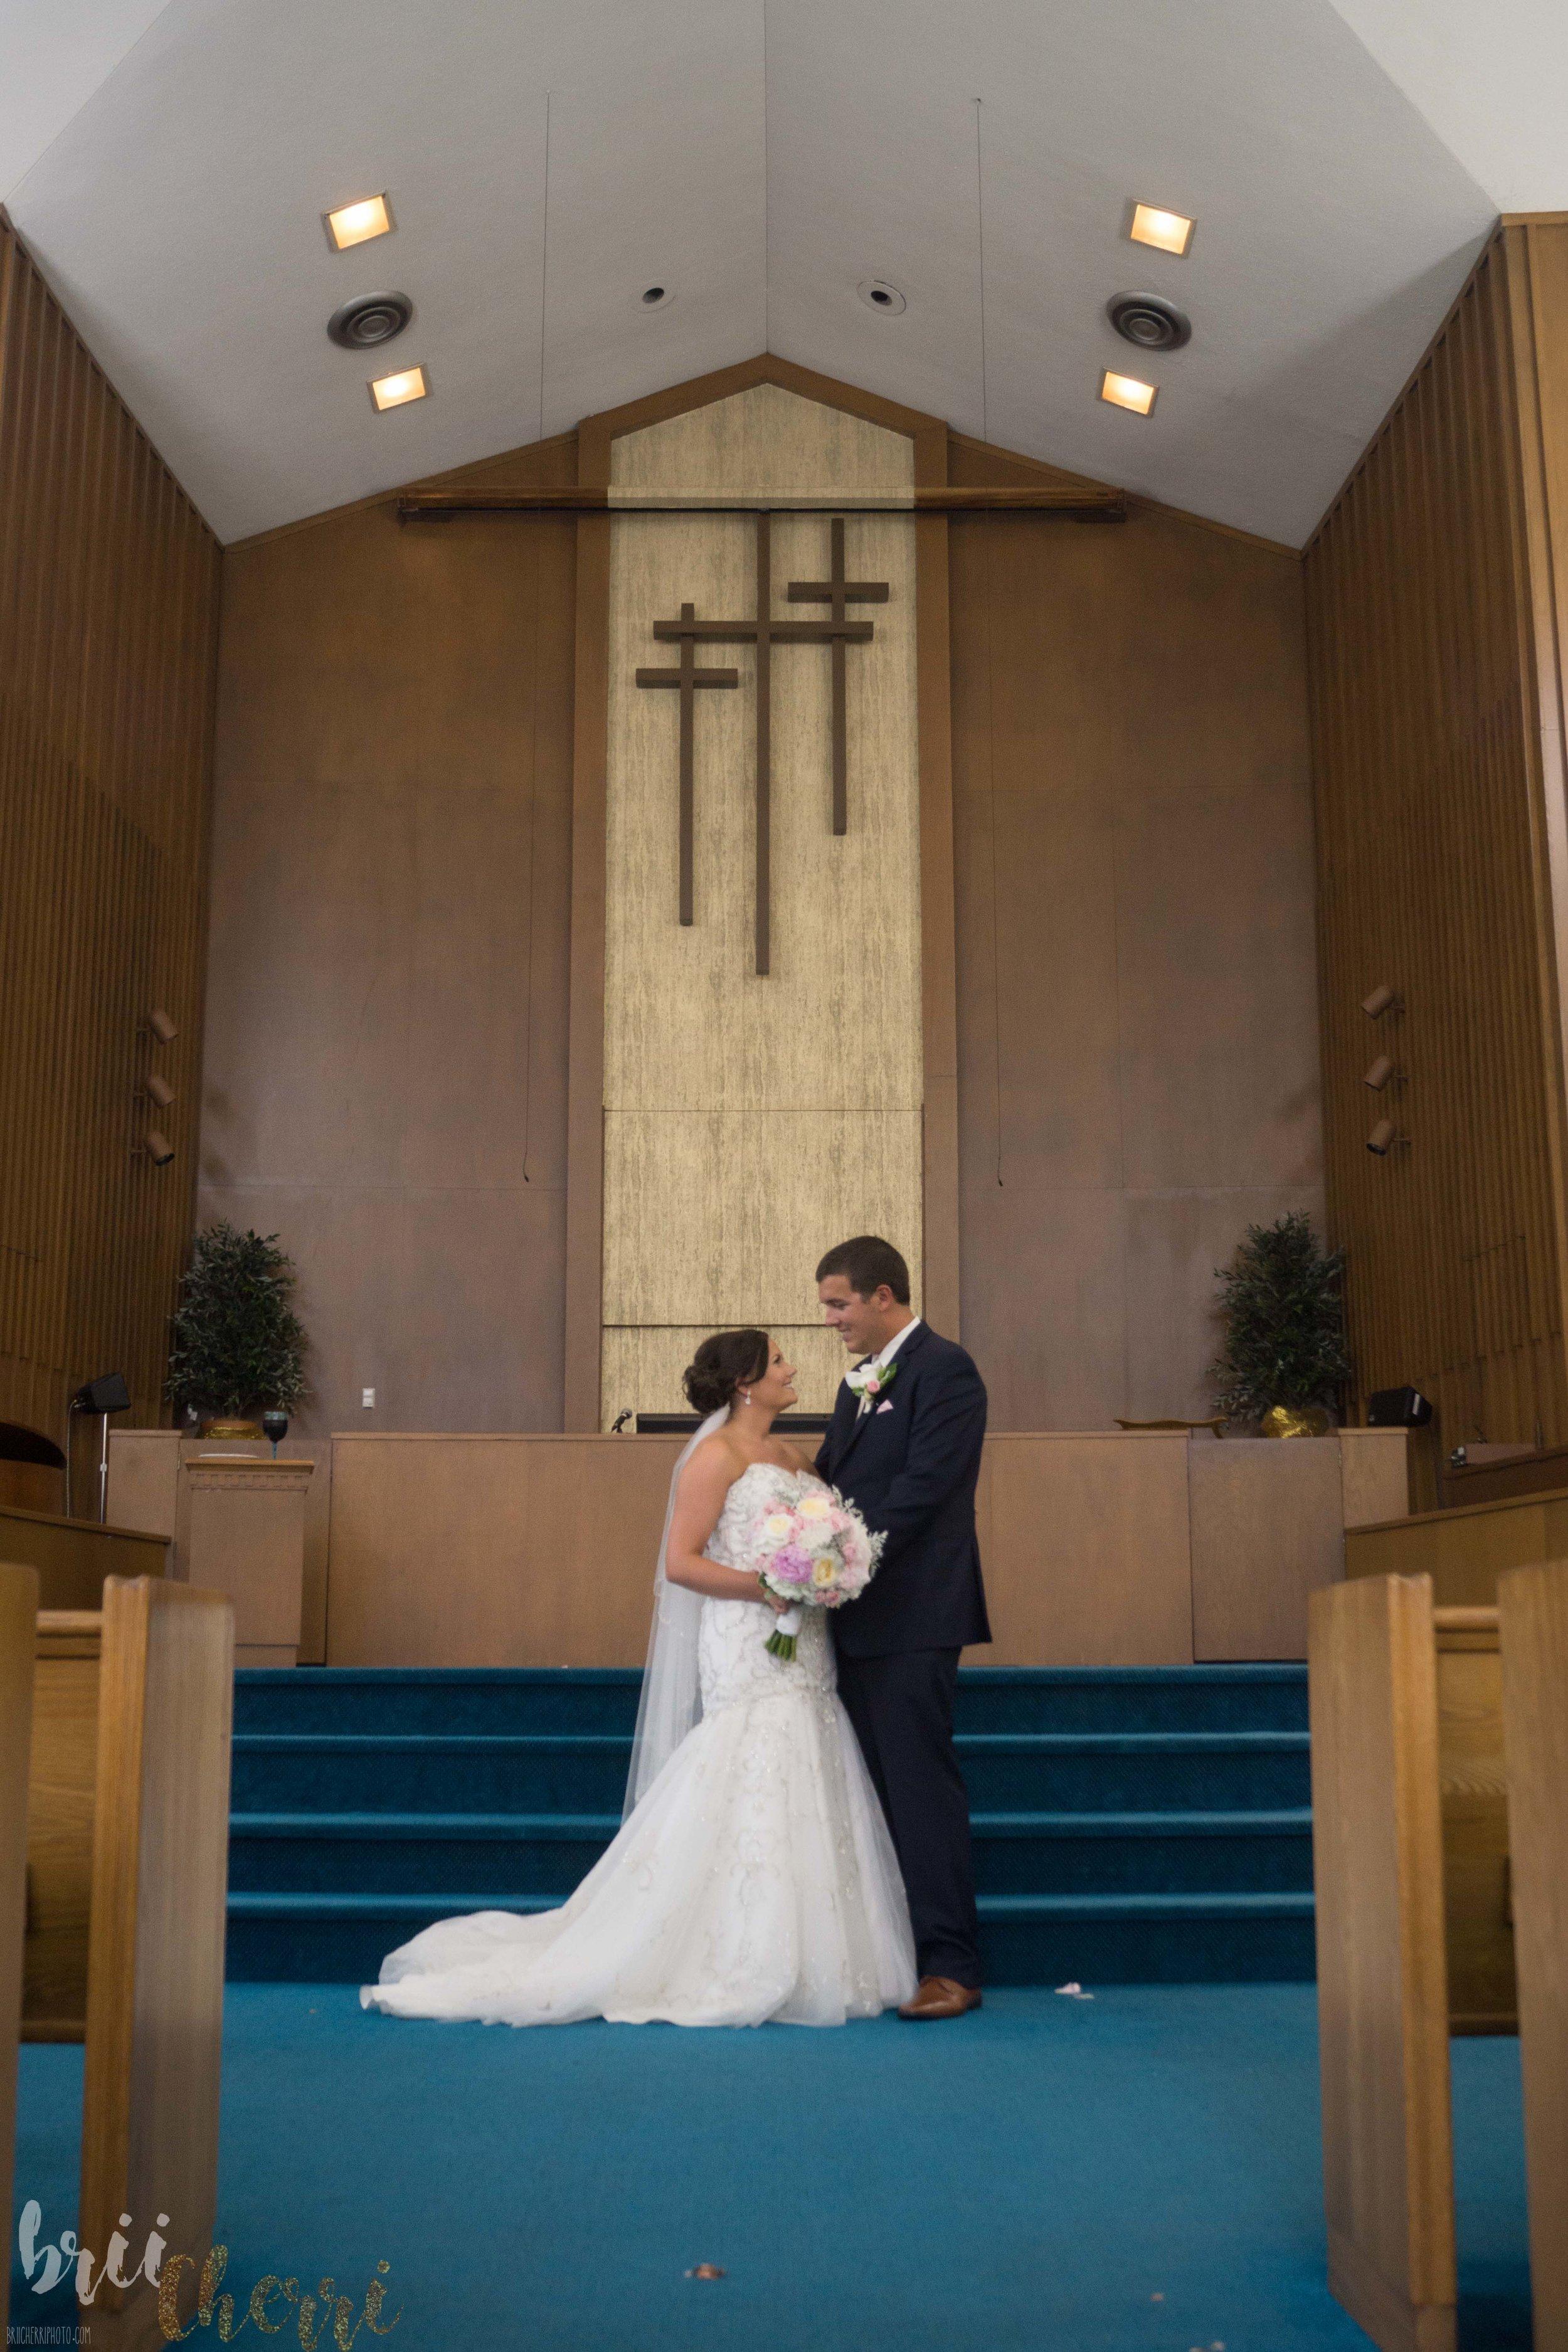 immanuel baptist church greenville nc Wedding